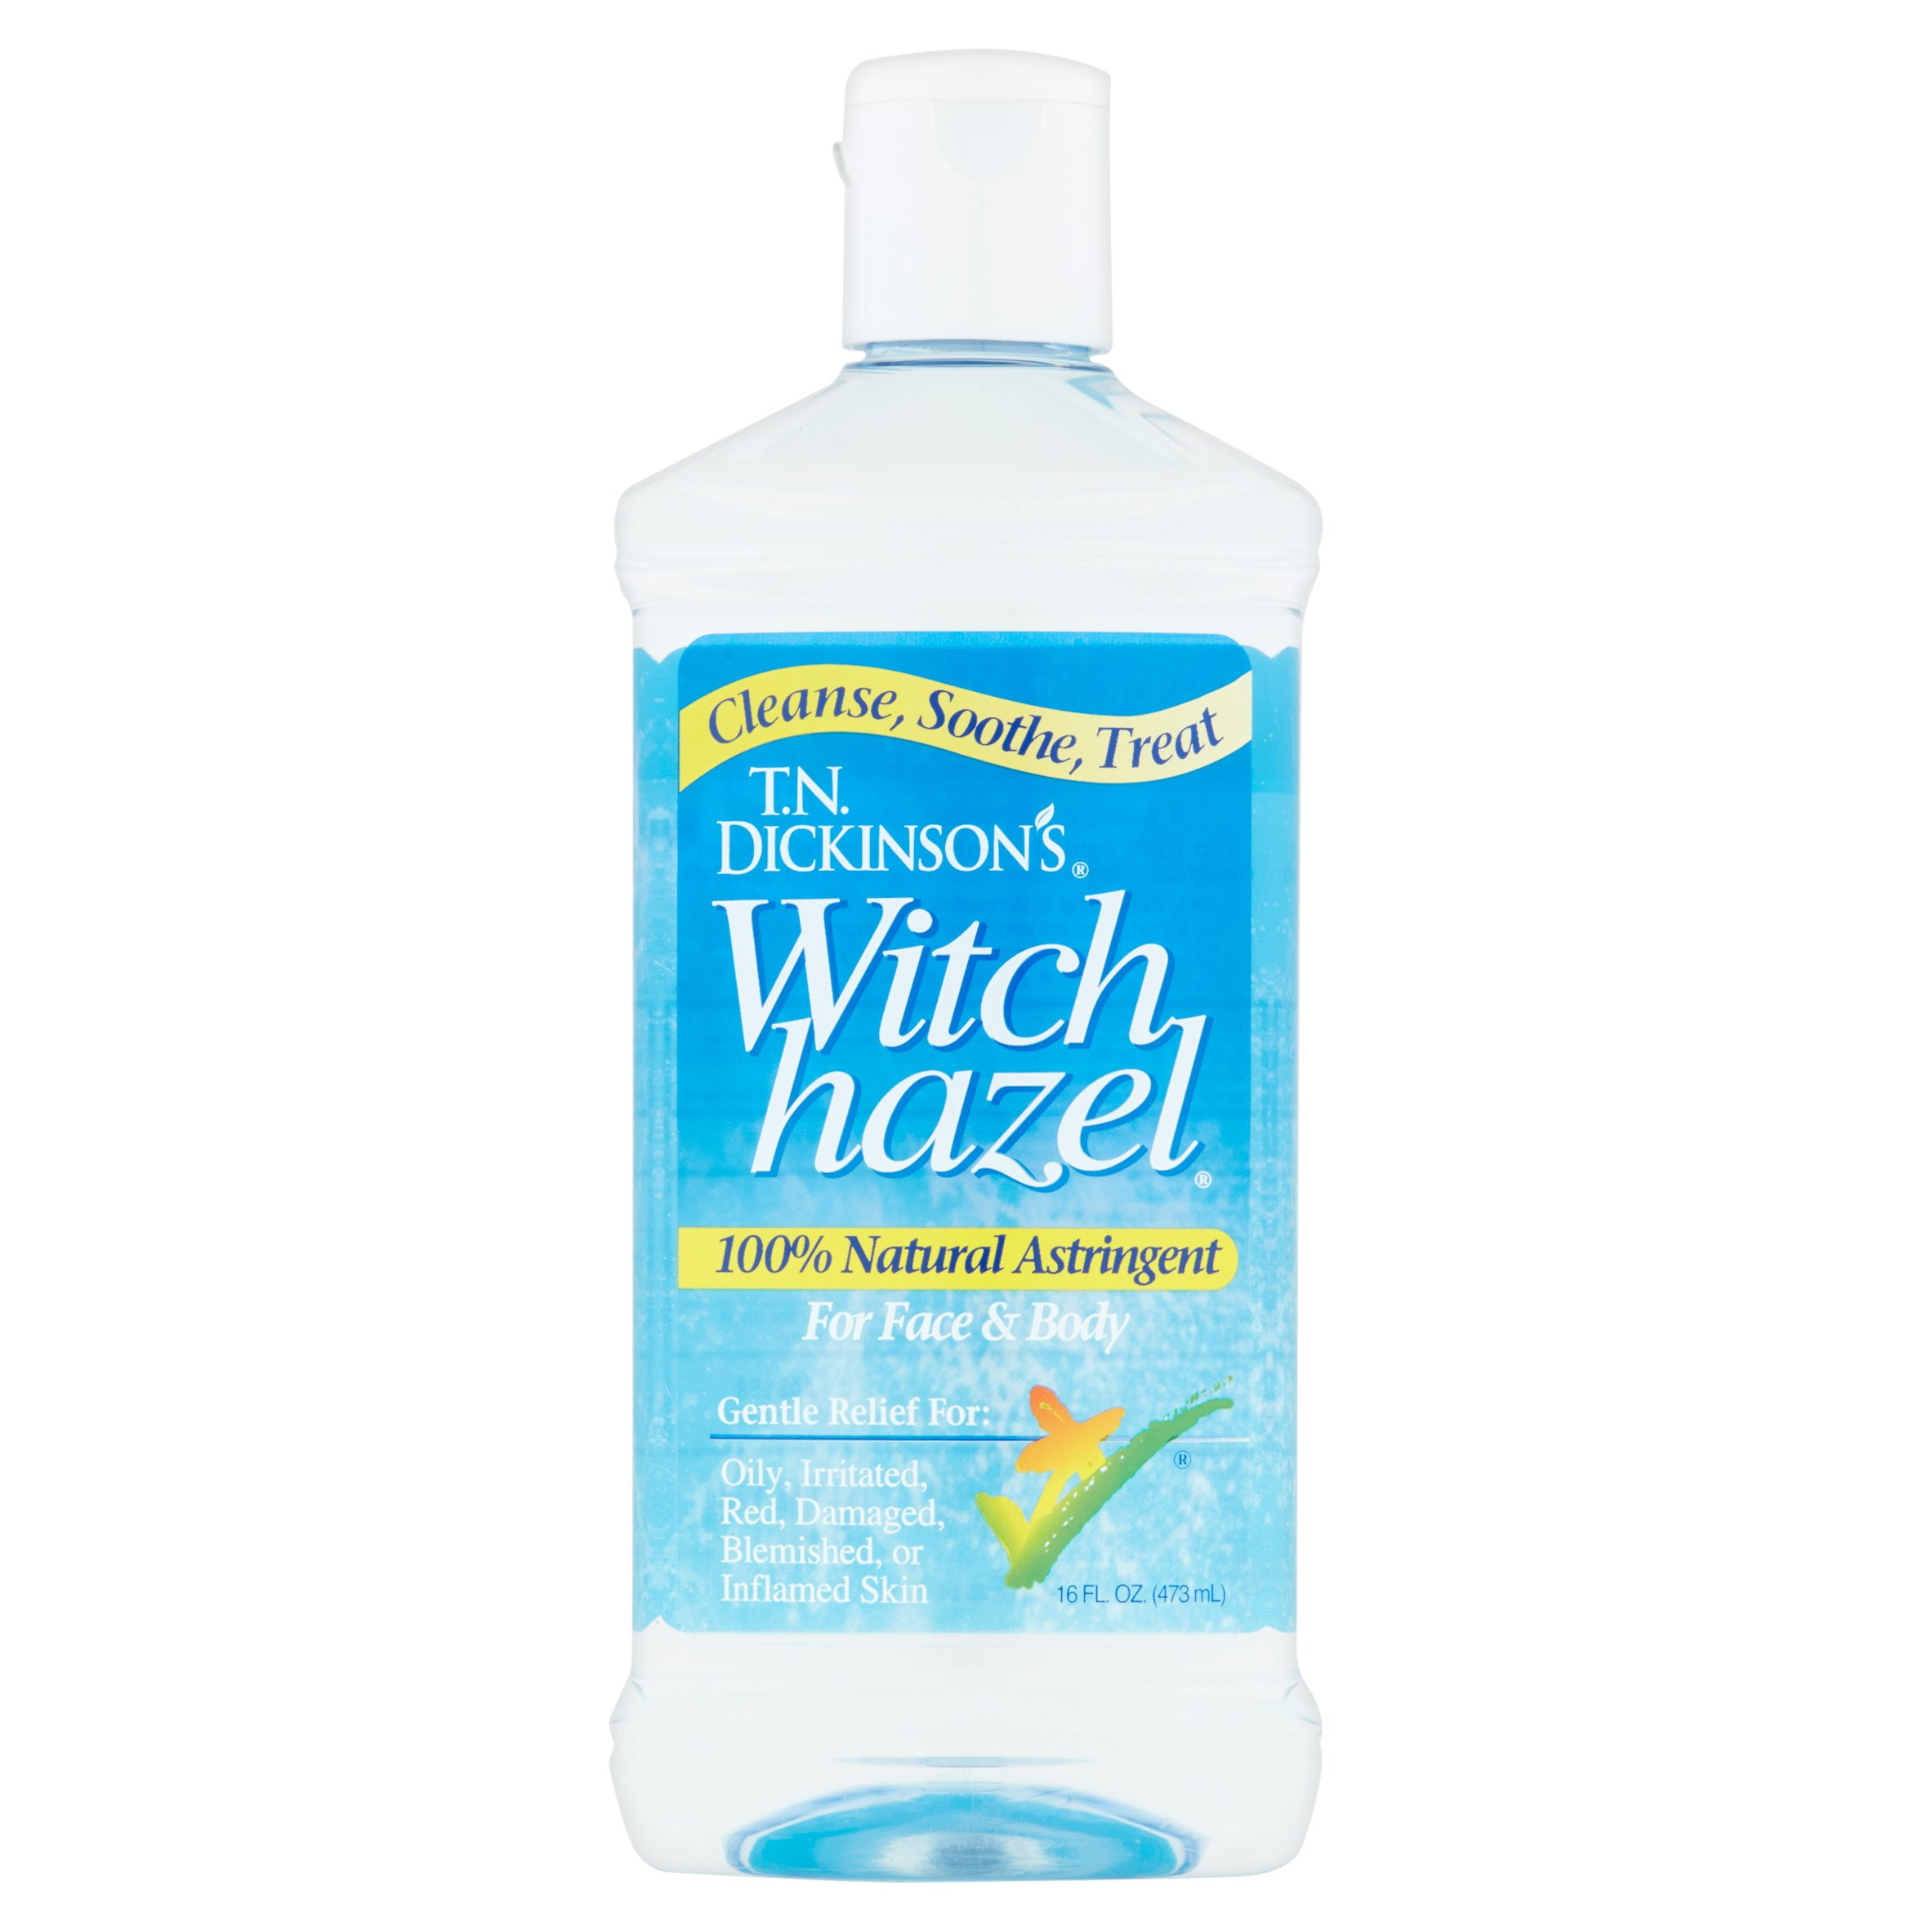 T.N. Dickinson's Face & Body Witch Hazel Astringent, 16 fl oz